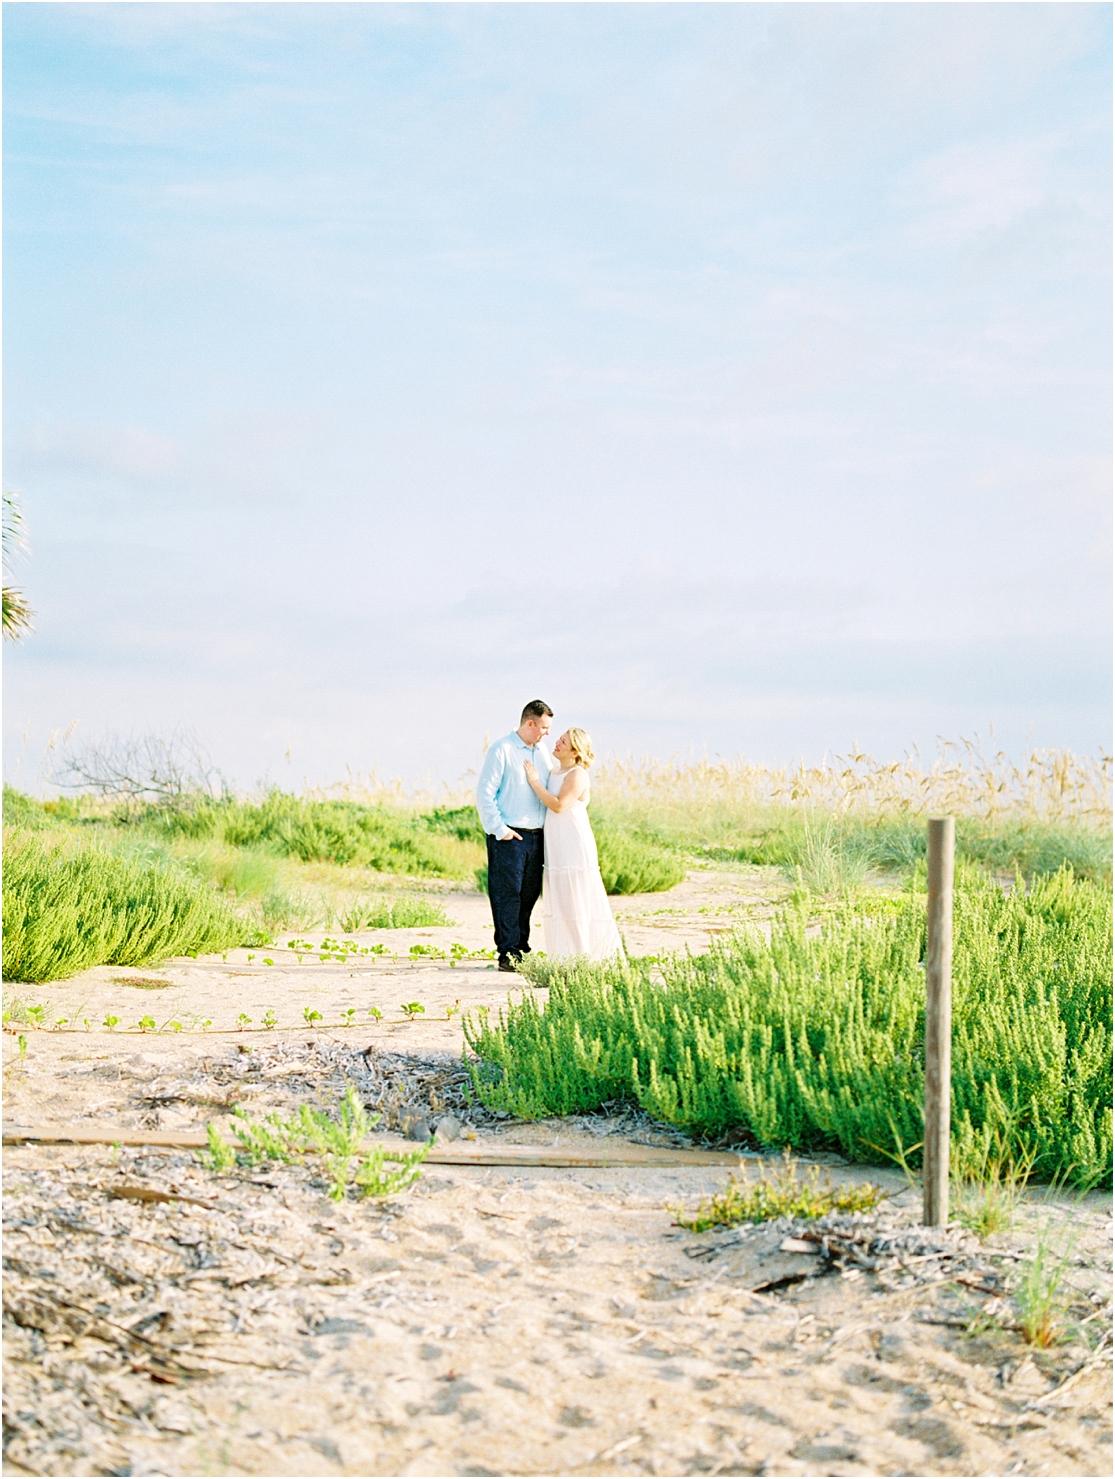 Lisa Silva Photography- Ponte Vedra Beach, St. Augustine and Jacksonville, Florida Fine Art Film Wedding Photography- Sunrise Engagement Session at  Vilano Beach_0023.jpg